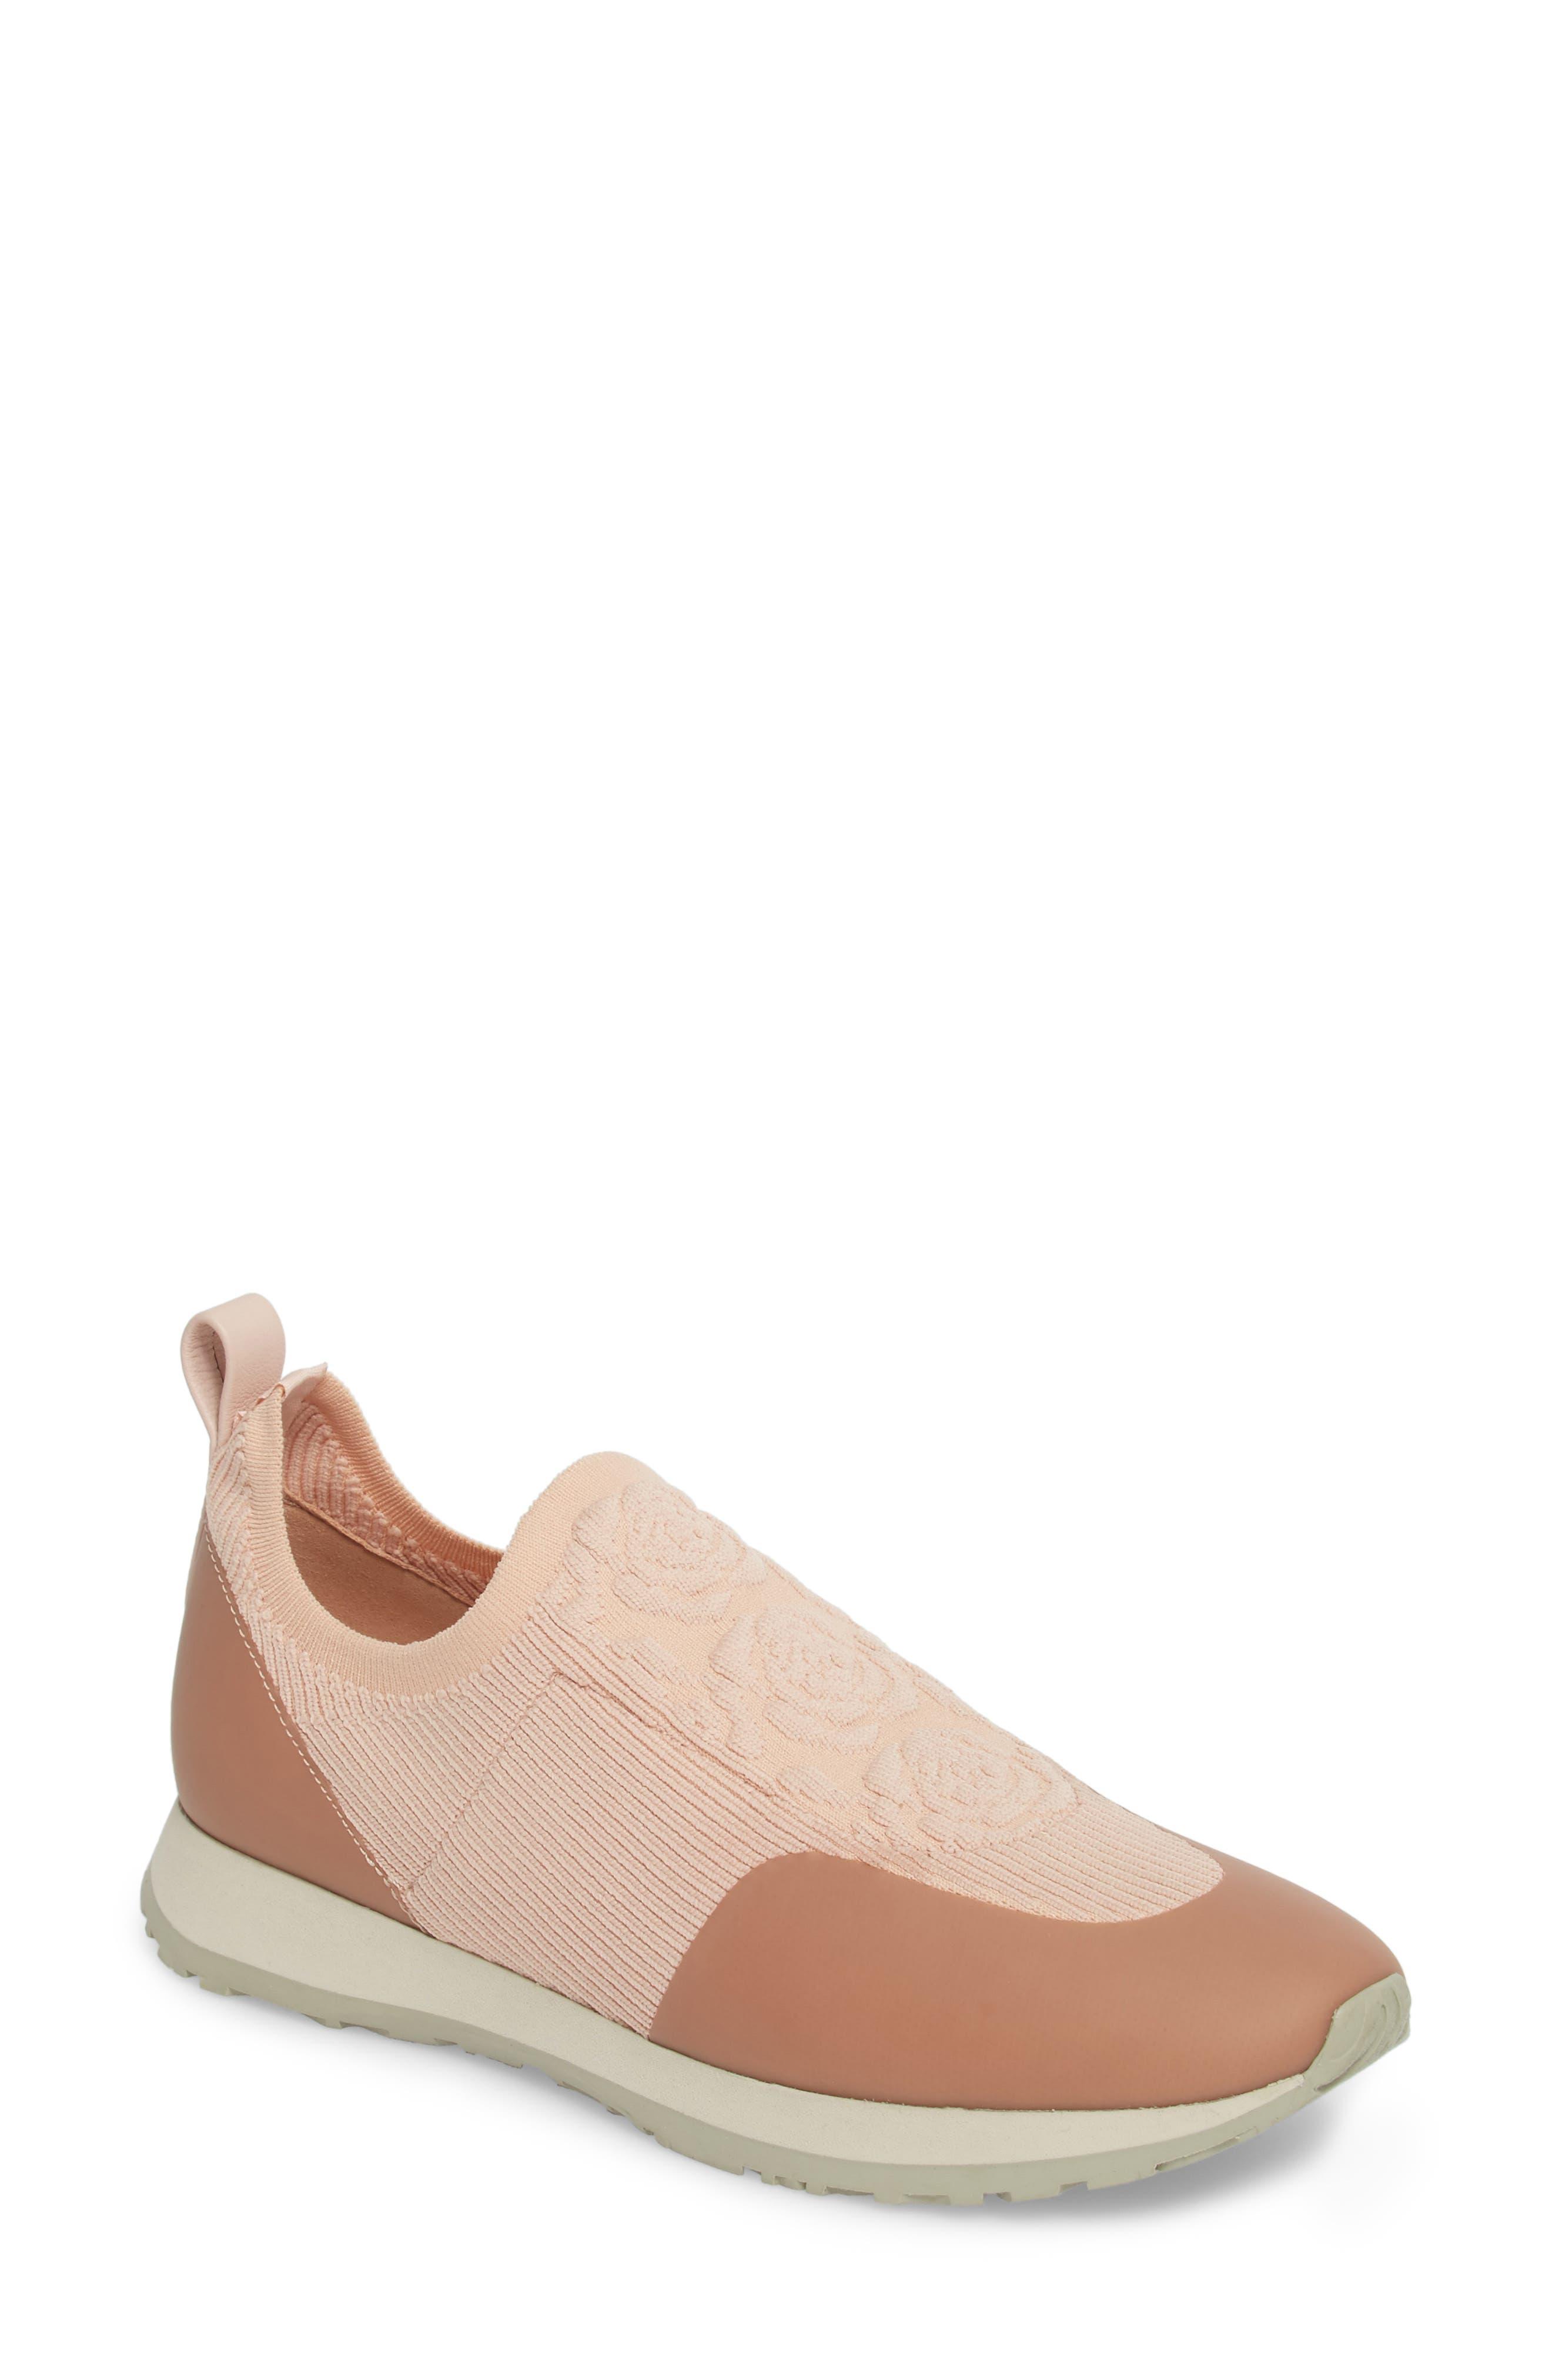 Main Image - Taryn Rose Cara Slip-On Sneaker (Women)